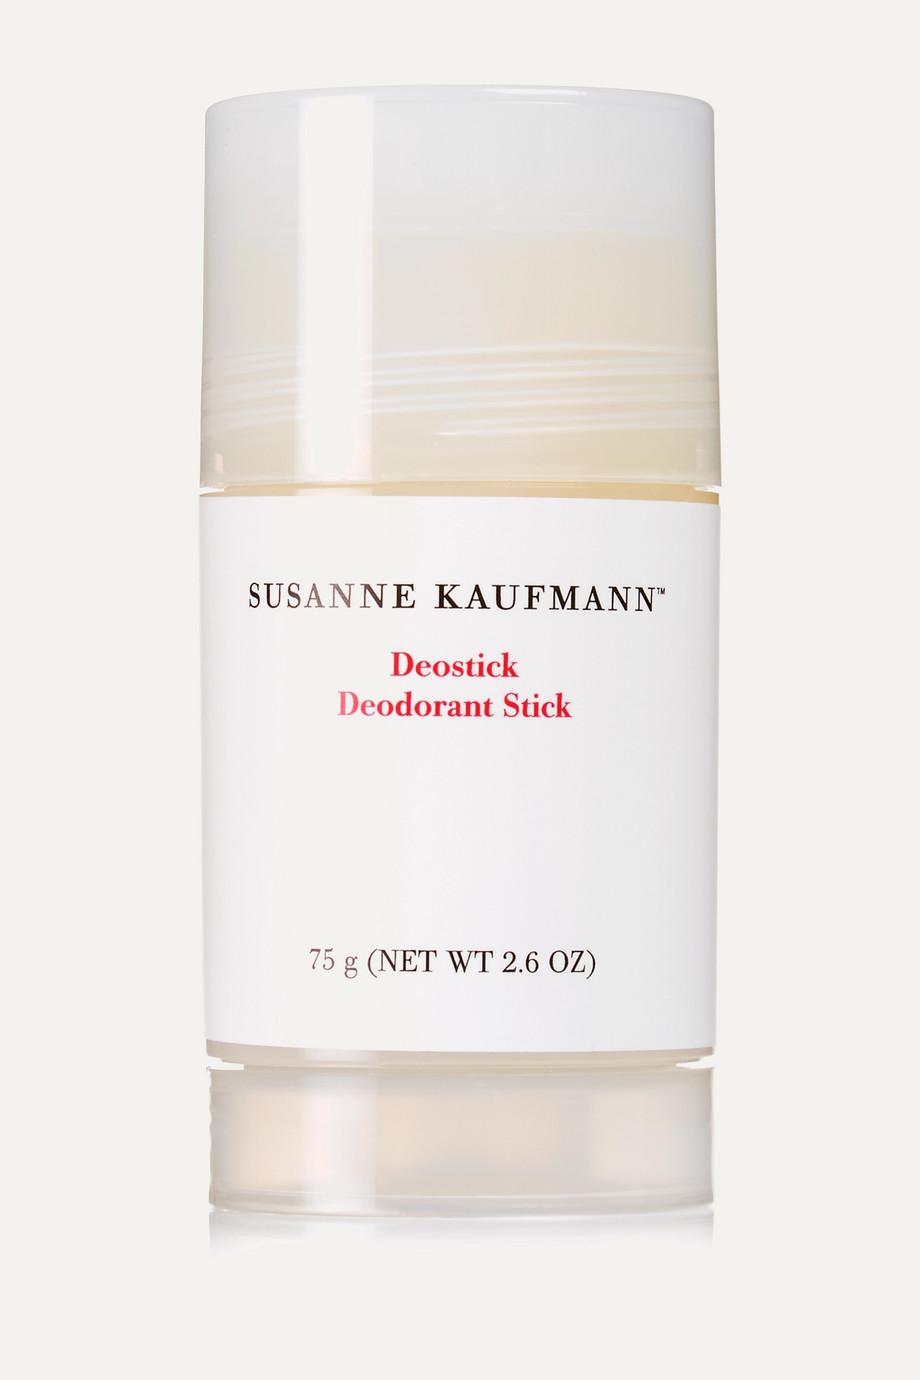 Susanne Kaufmann Deostick, 75g